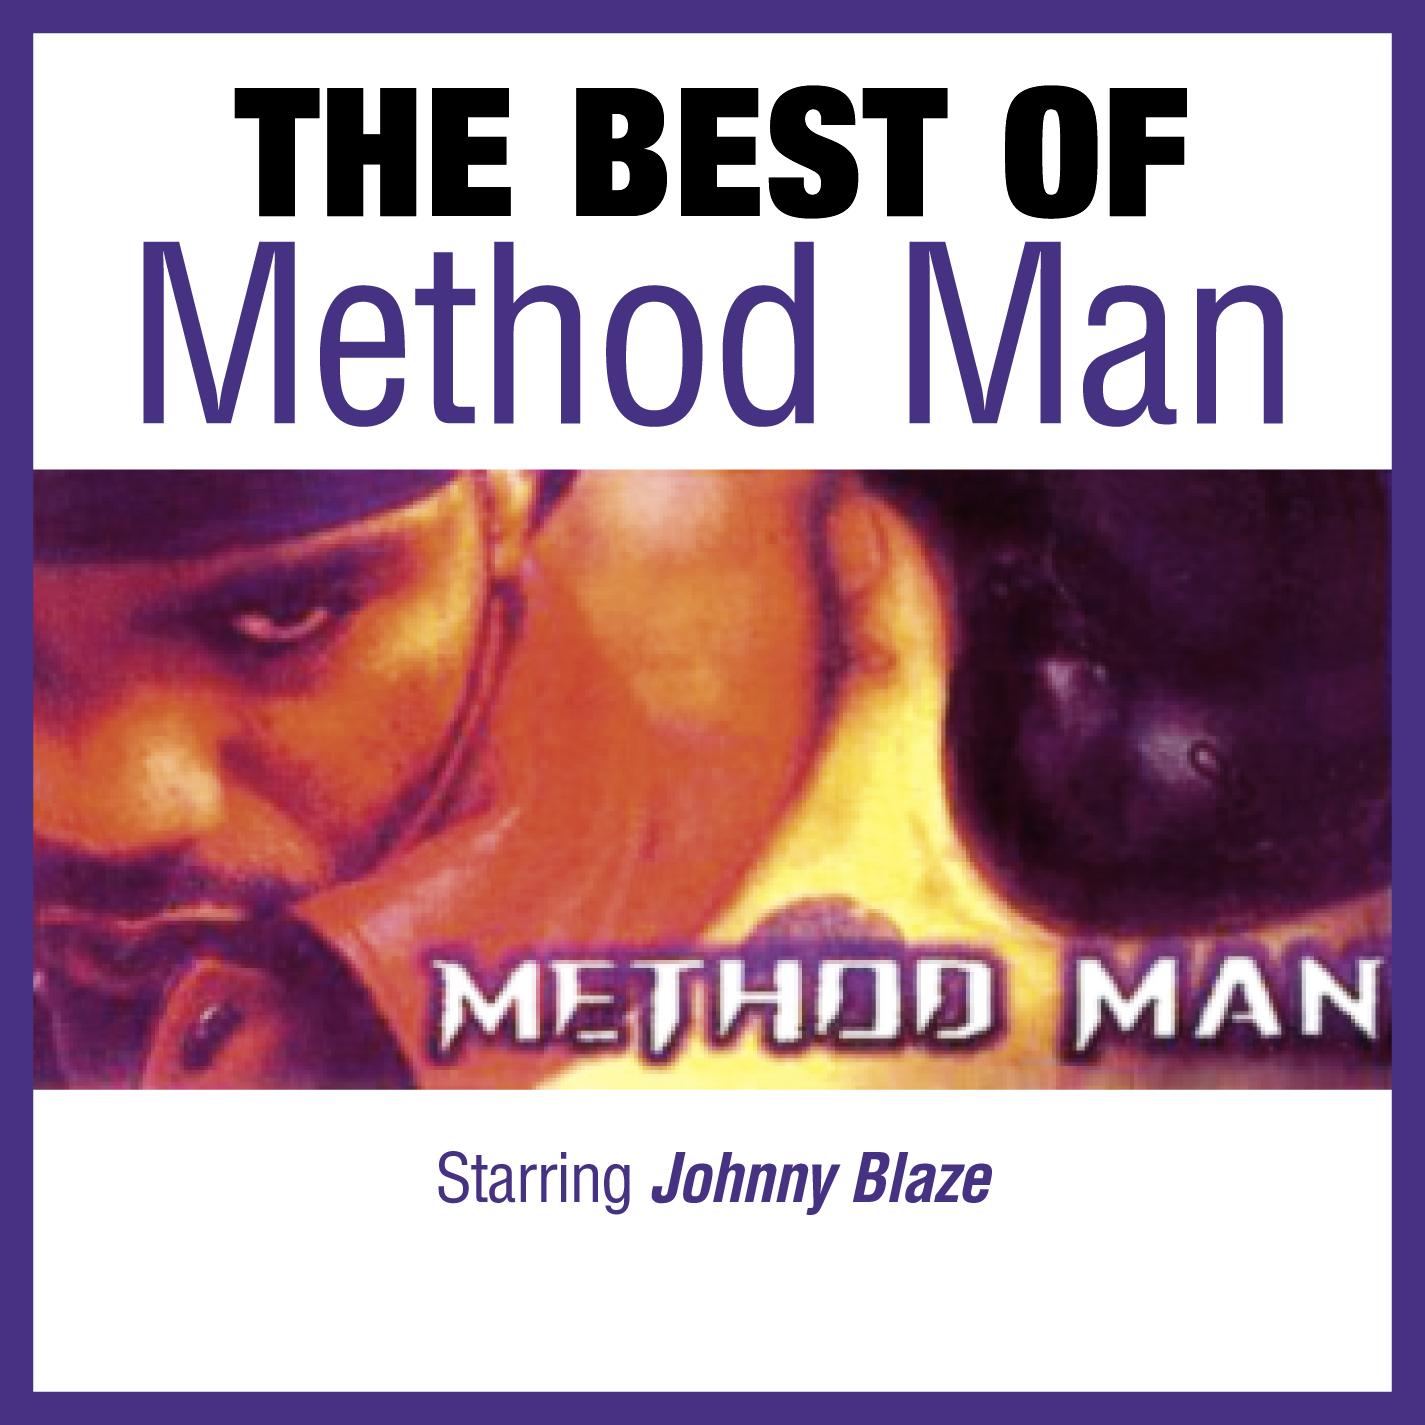 00_dj_mister_cee-the_best_of_method_man_%2528starring_johnny_blaze%2529.jpg